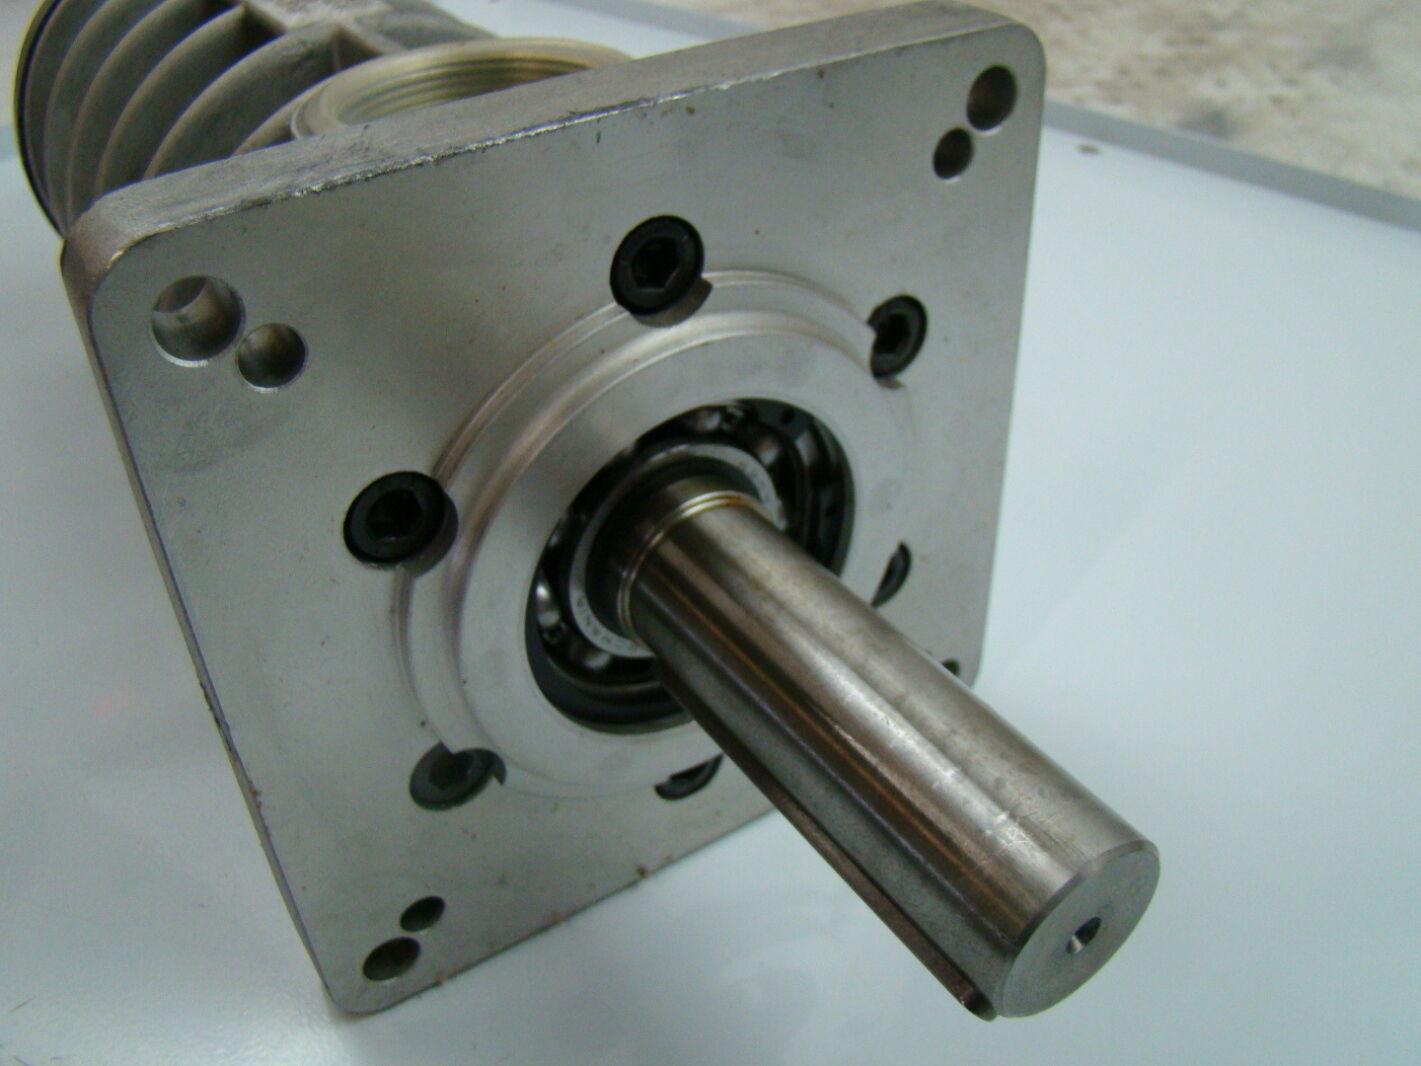 Settima meccanica smu series submersible hydraulic screw for Submersible hydraulic pump motor